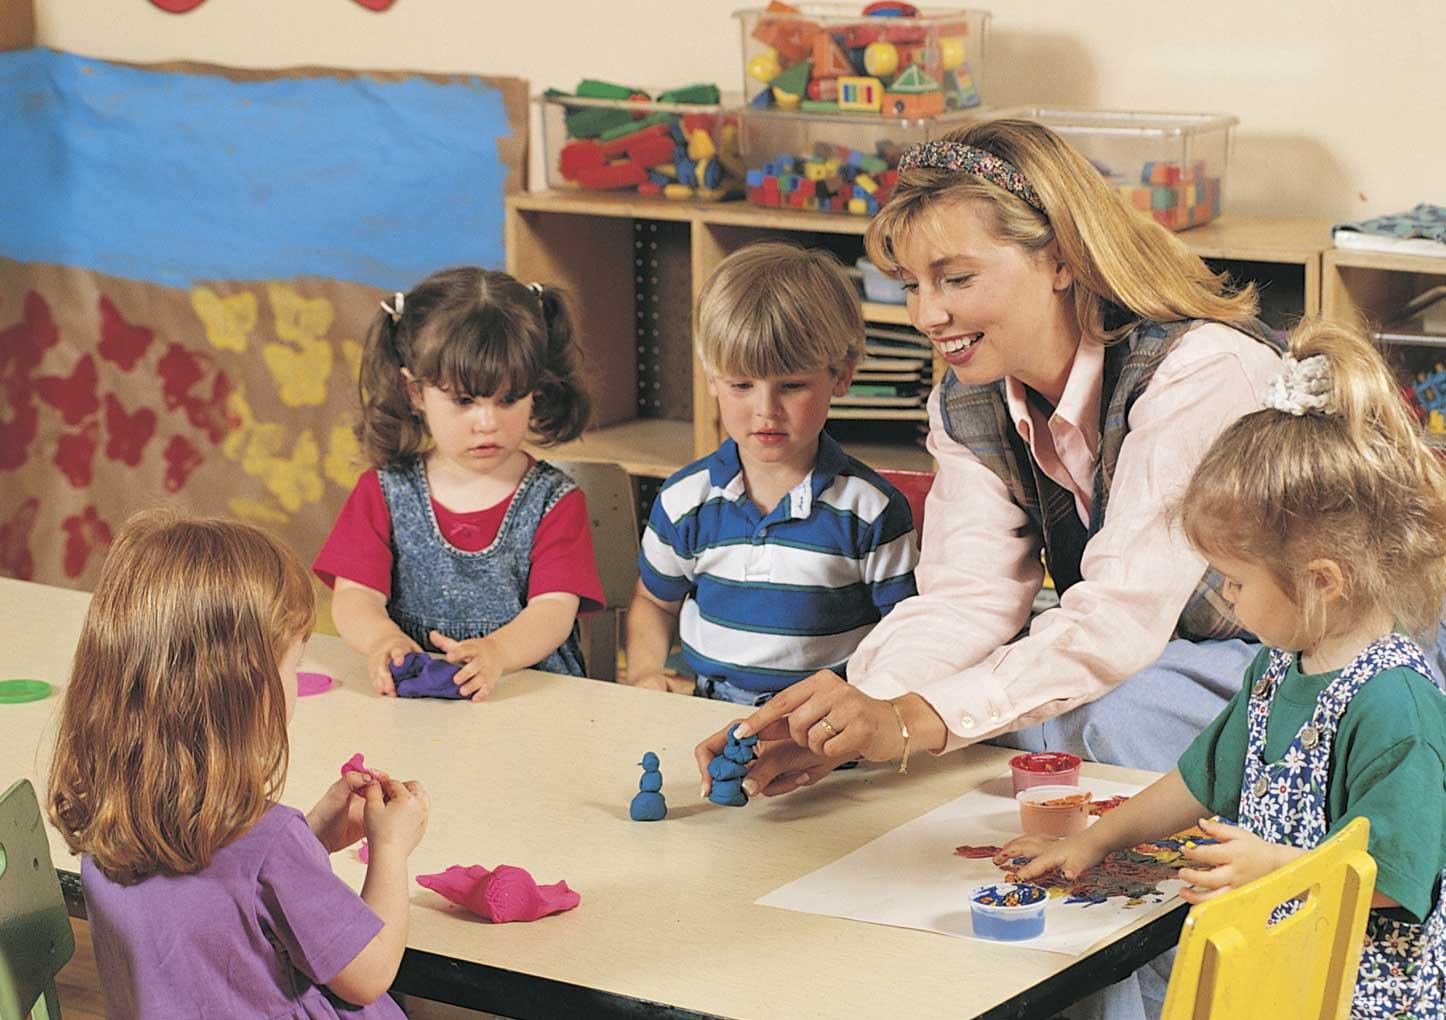 nursery at Crib to Whiz Playschool